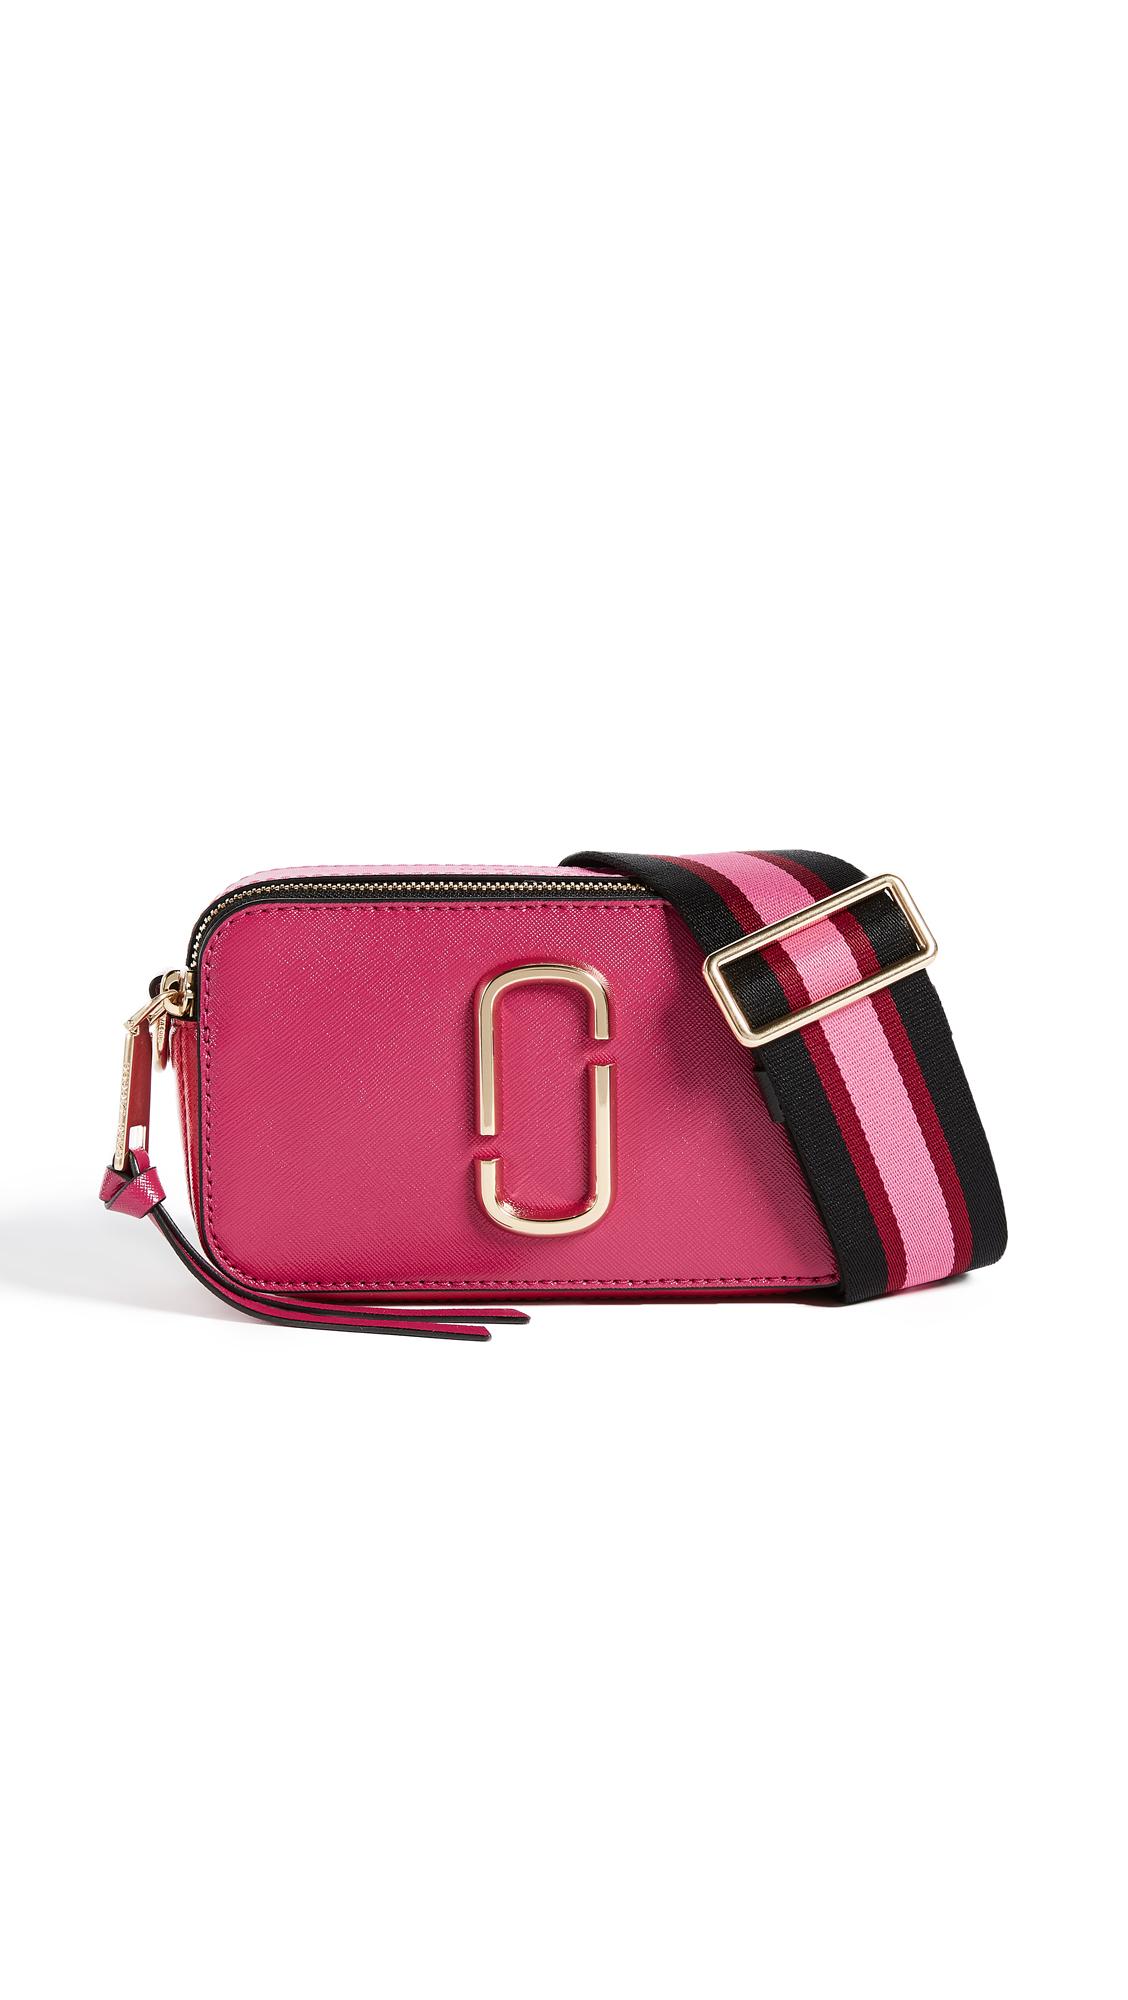 Marc Jacobs Snapshot Cross Body Bag - Hibiscus Multi